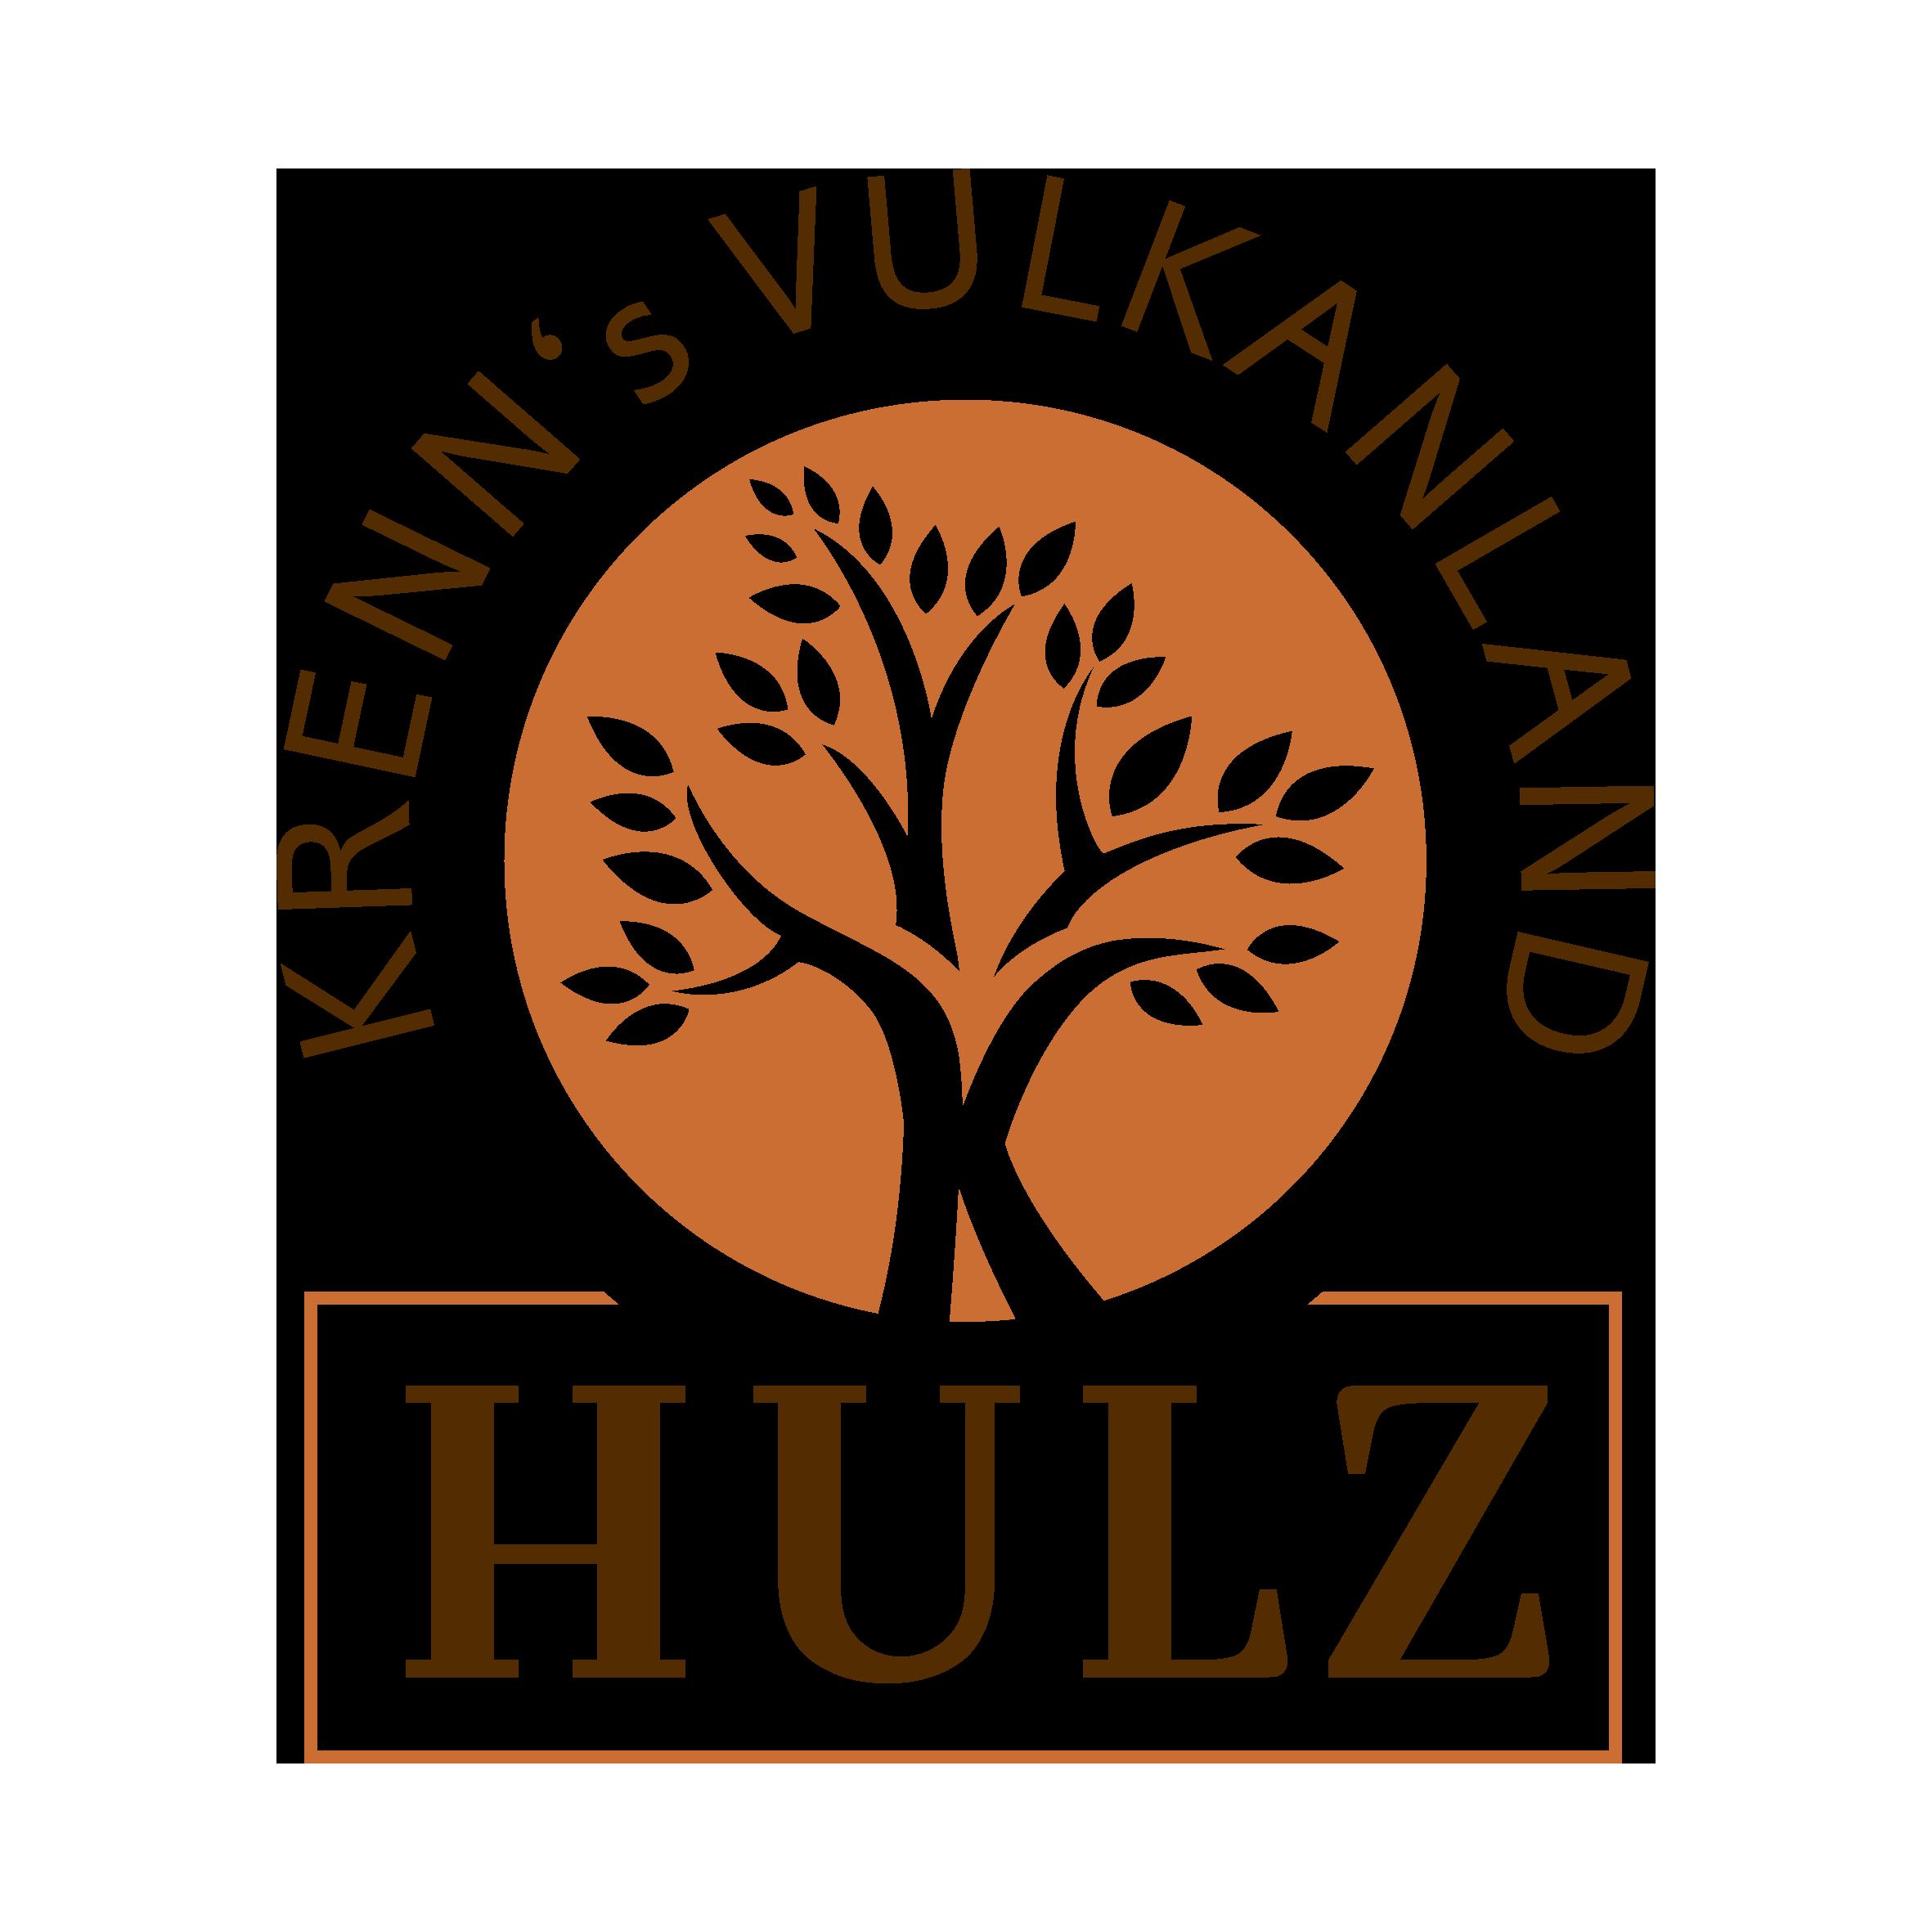 Marke Vulkanland Hulz-4c